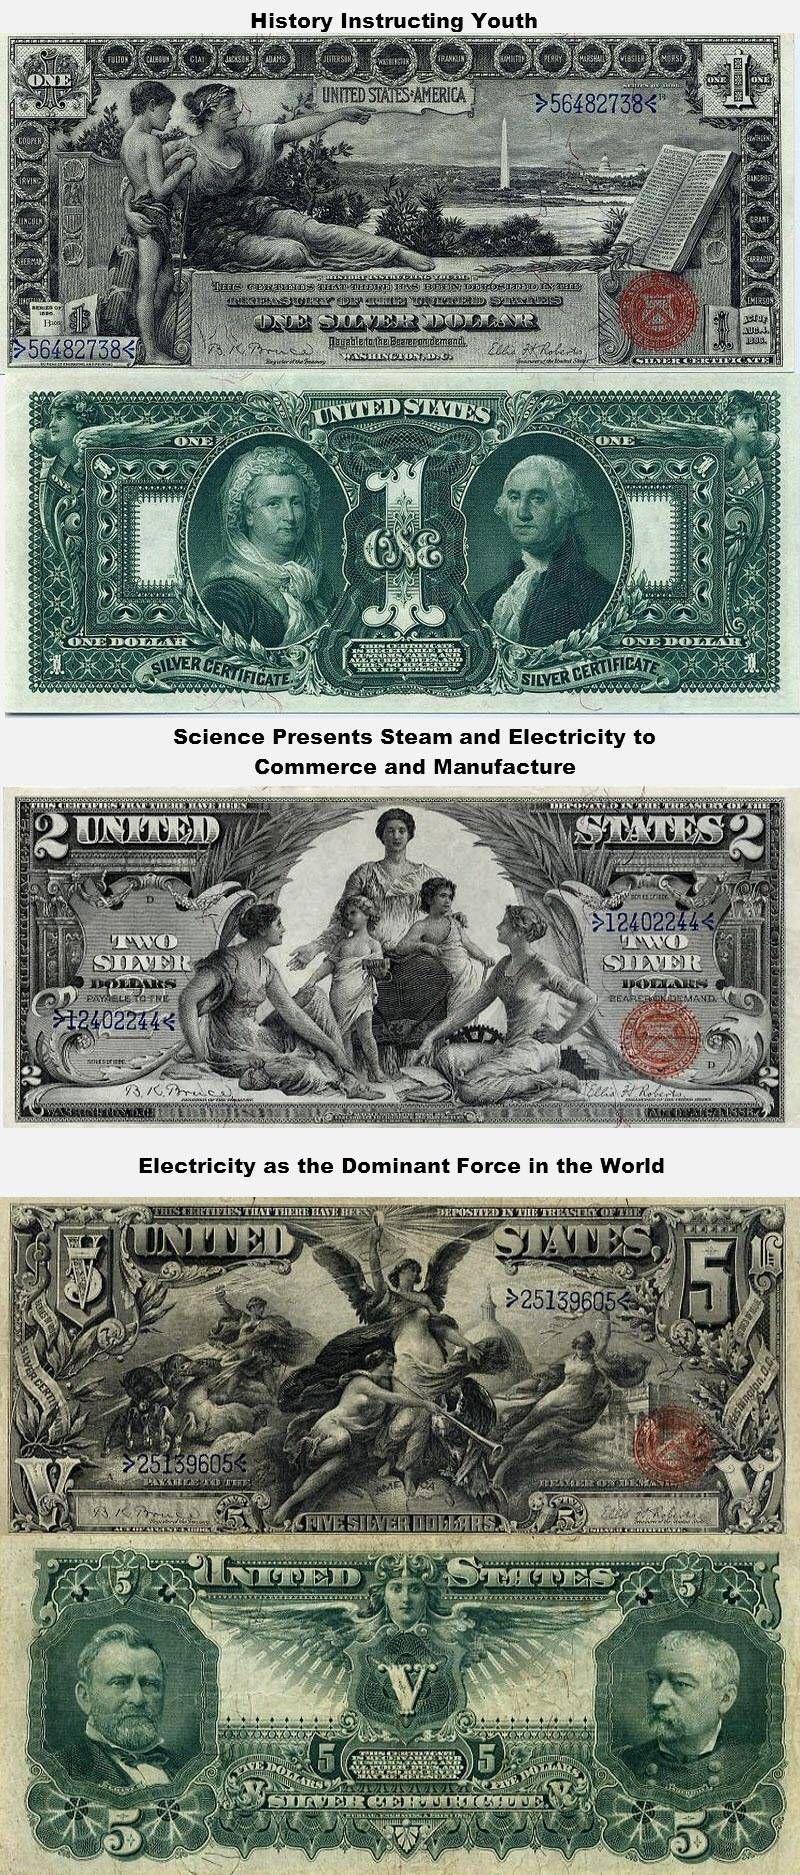 America Once Had Beautiful Educational